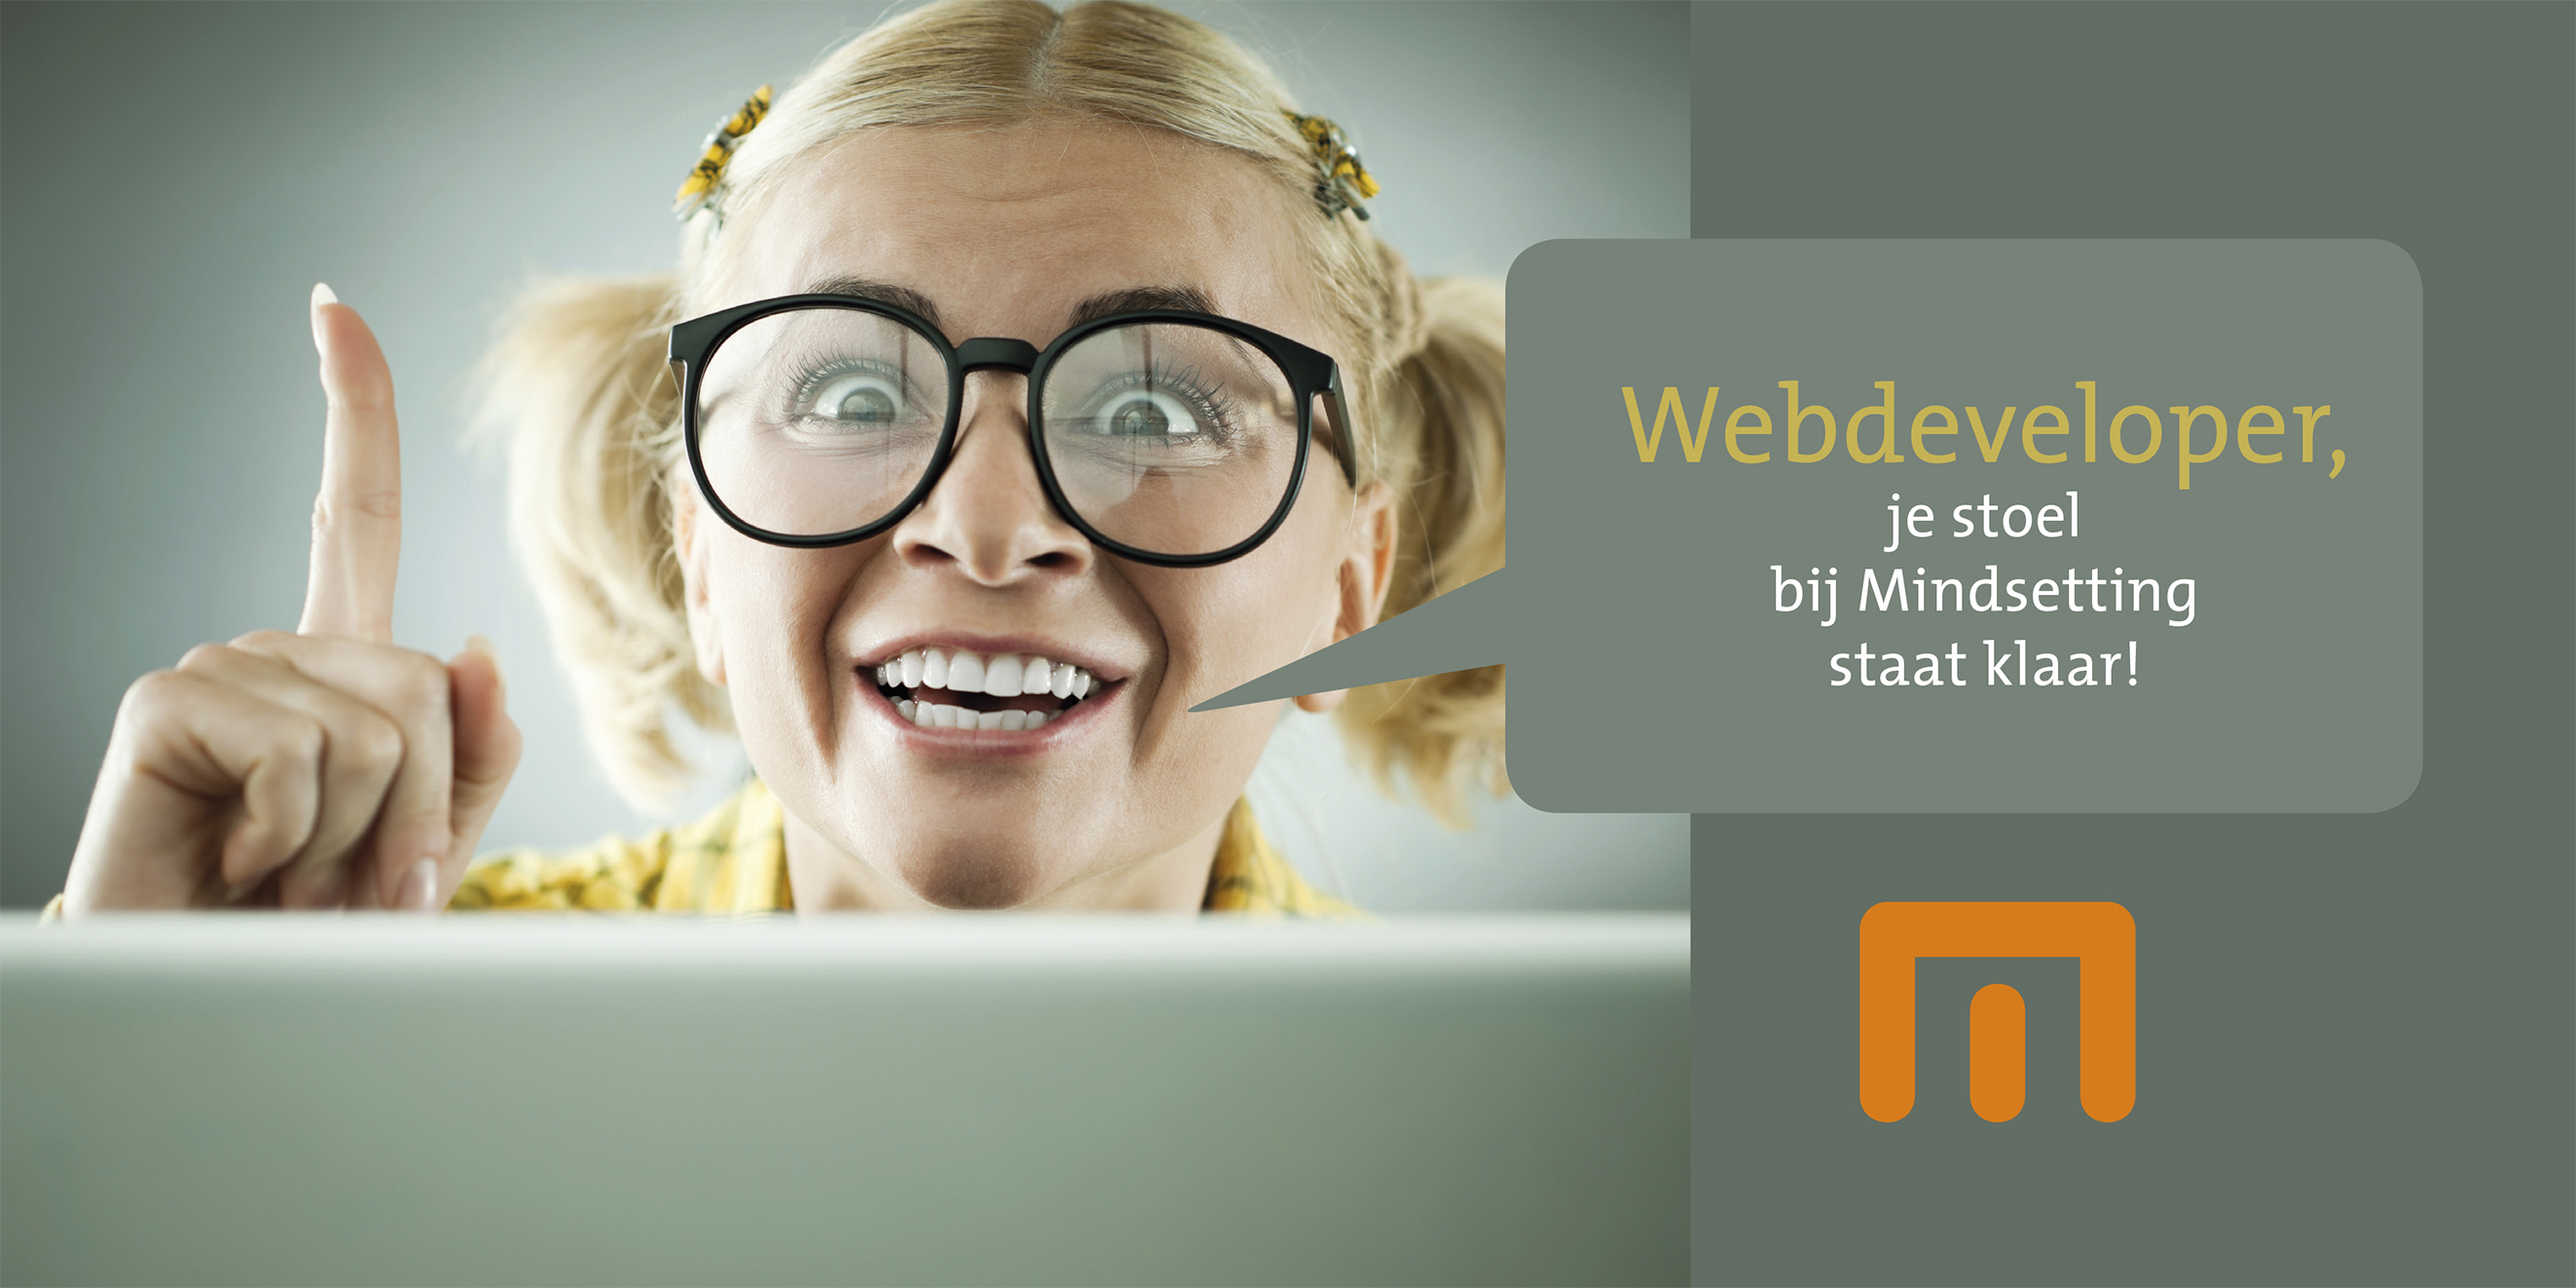 vacature webdeveloper